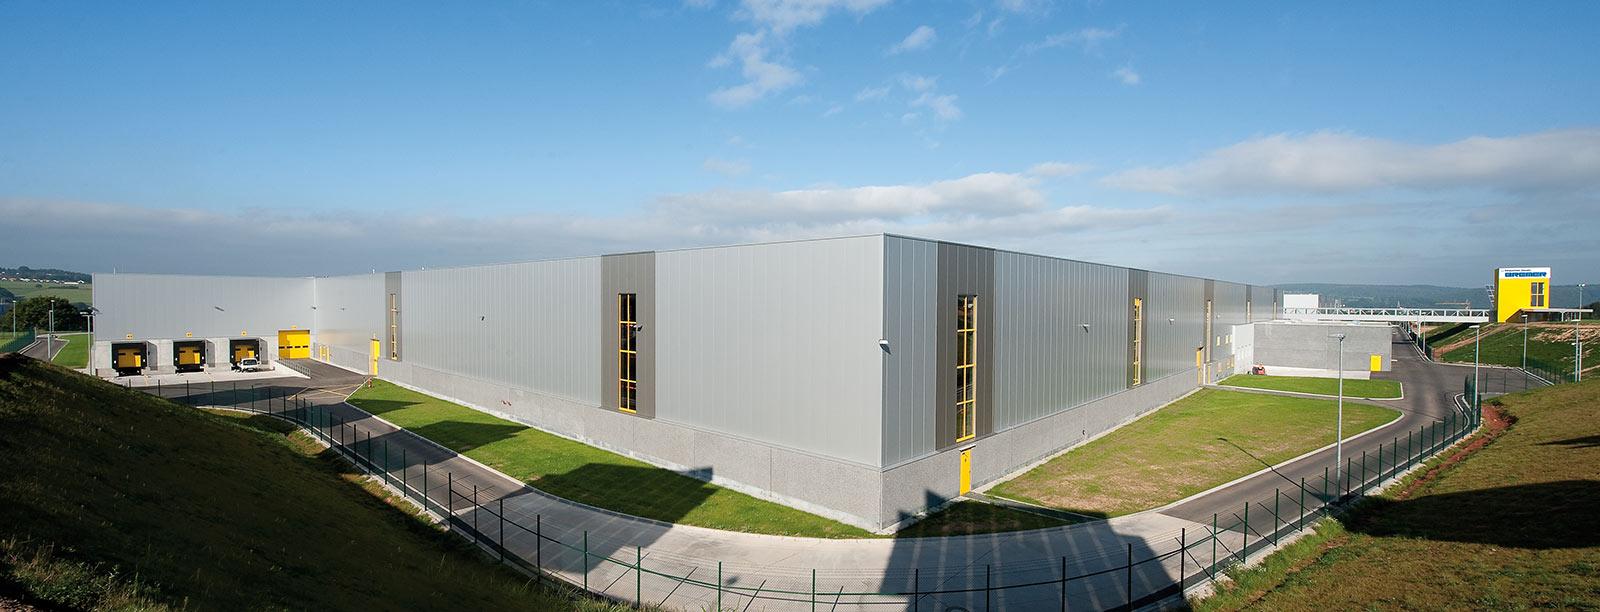 Parcello Amazon Logistics